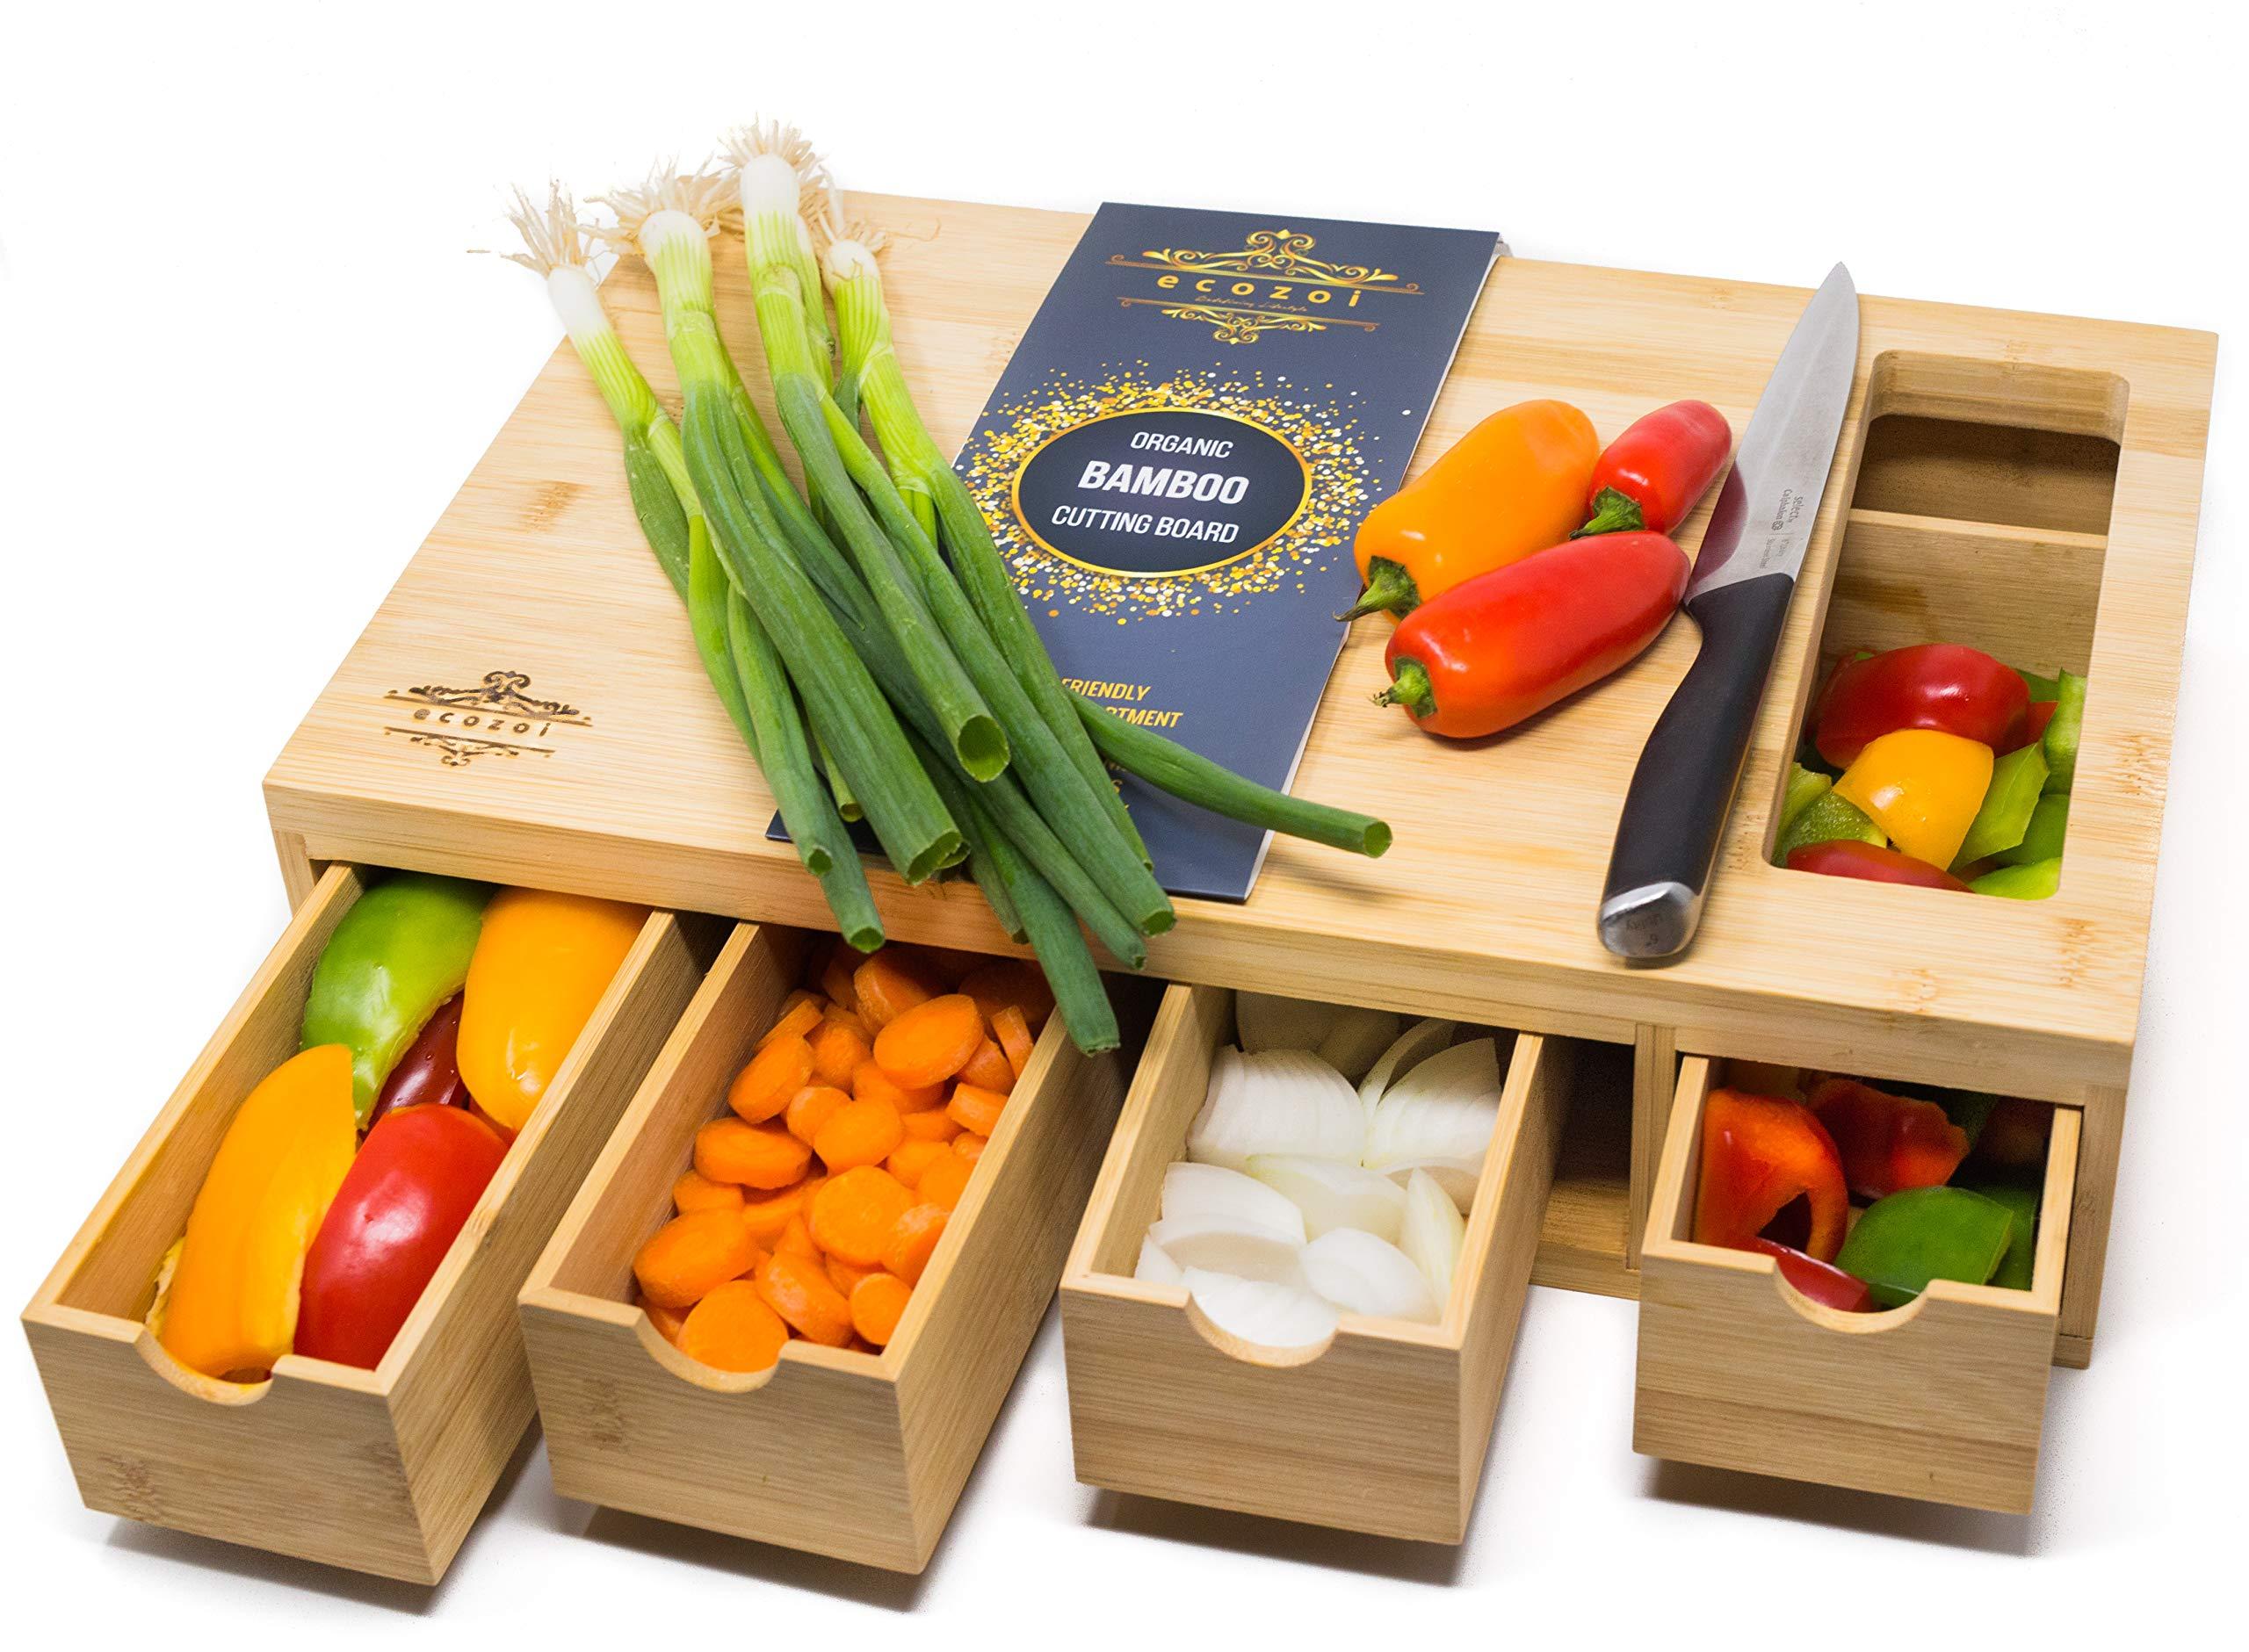 ecozoi EXTRA LARGE Bamboo Cutting Board with 4 Bamboo Drawer ORGANIZER TRAYS | Kitchen Cutting Boards, Chopping Boards, Butcher Block | ERGONOMIC Cutting Board with Storage